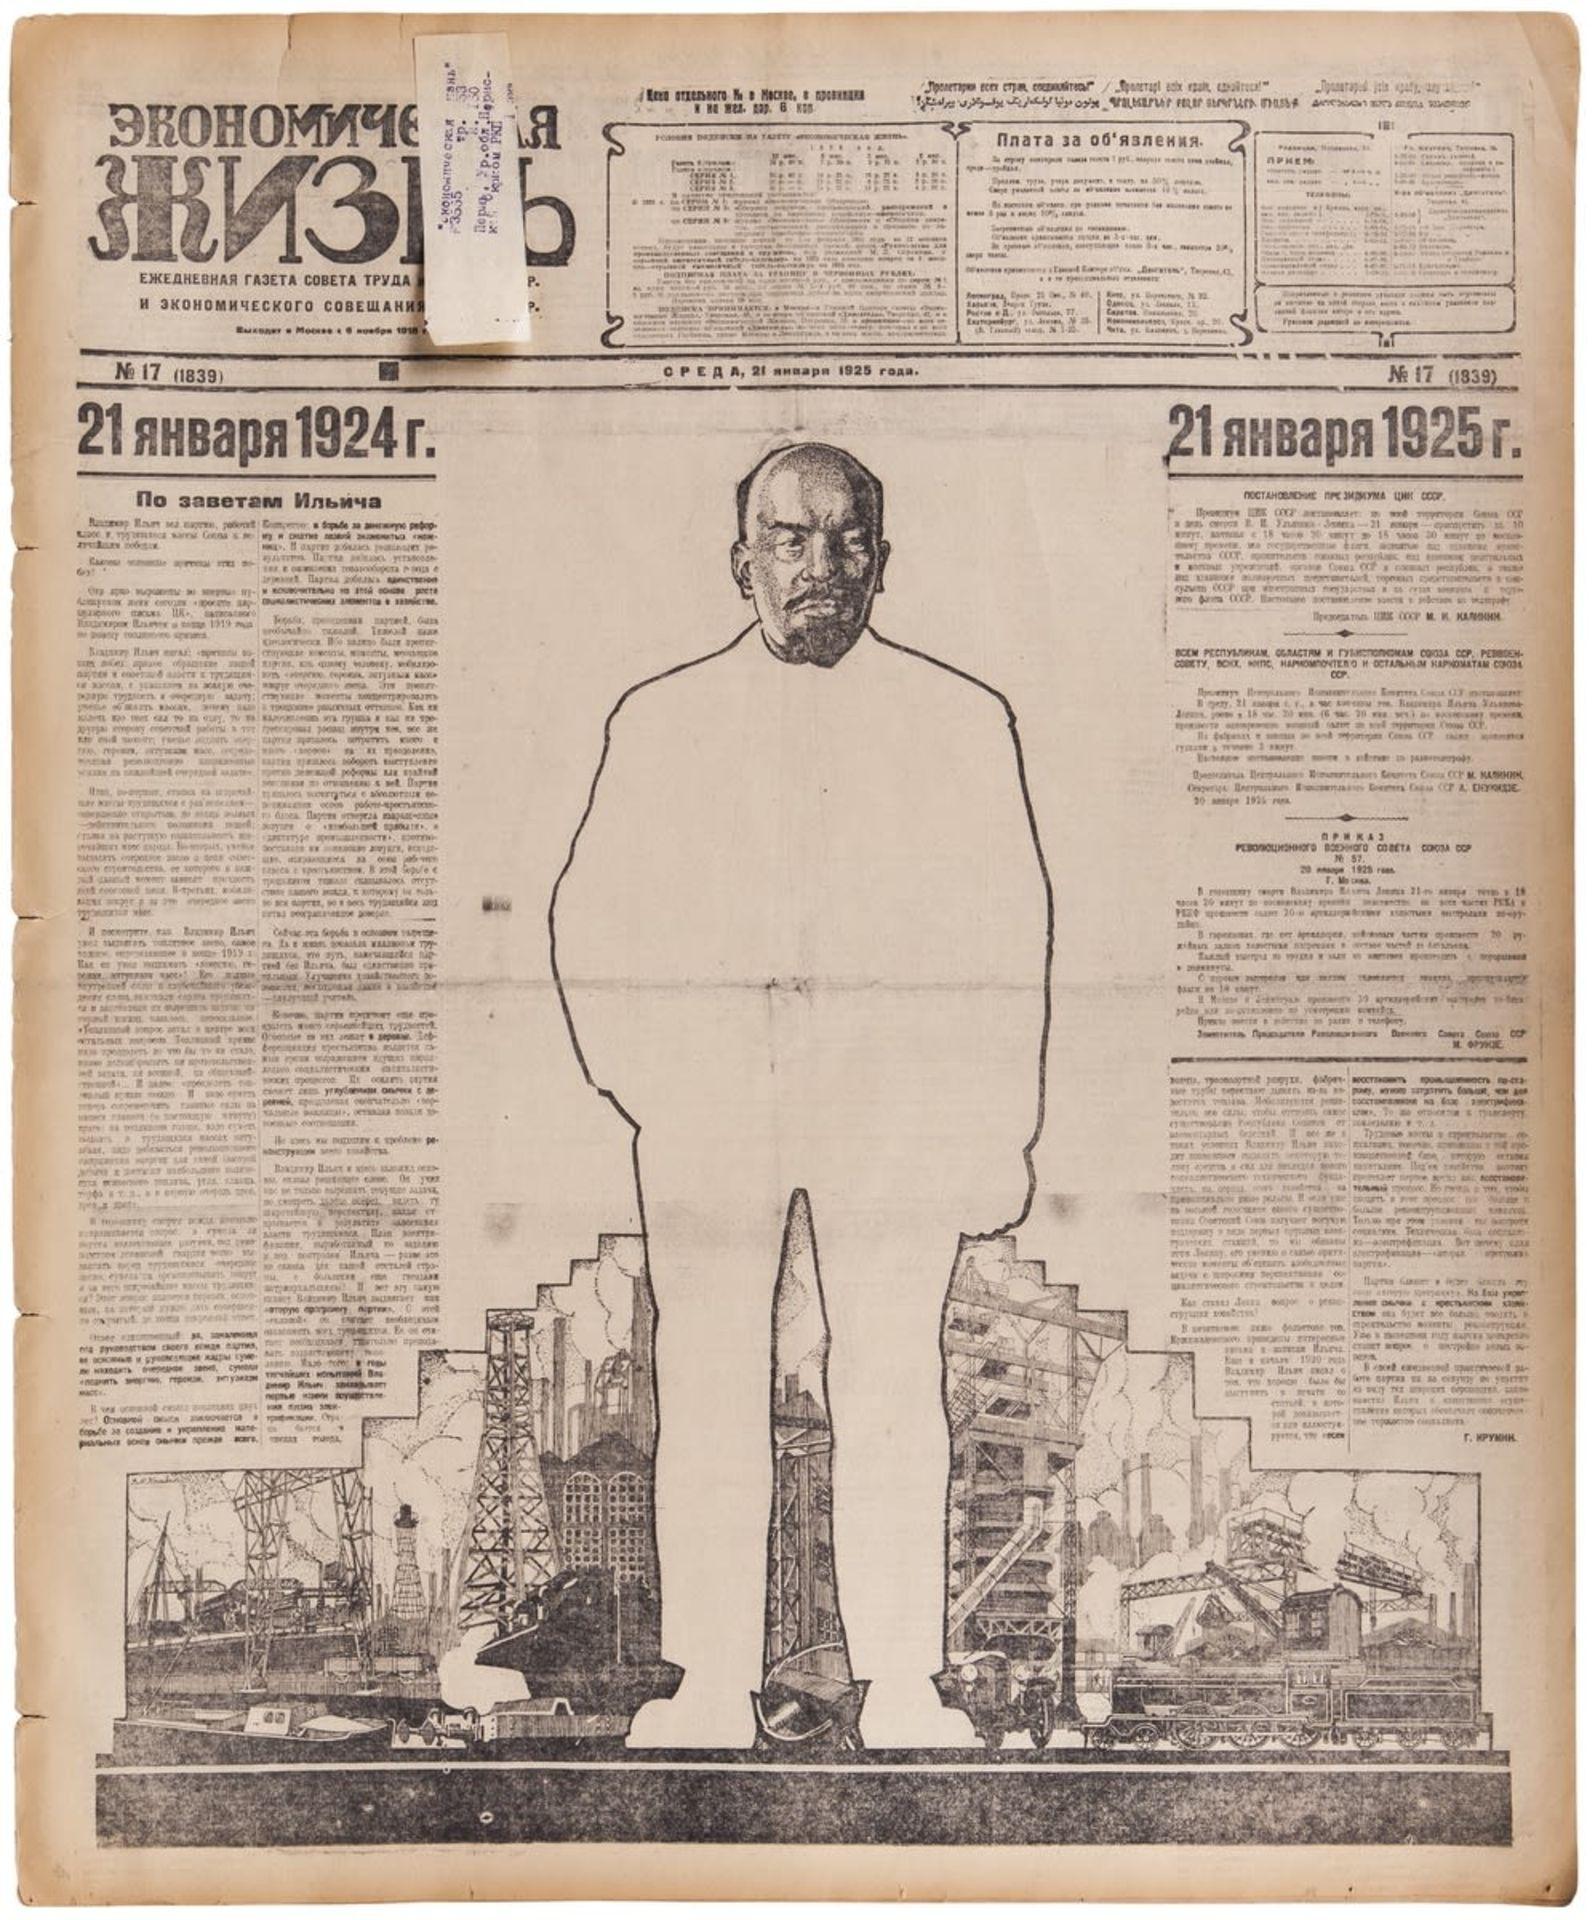 [Soviet art]. Newspaper: Economic Life. Issue 17th, 21st January 1925. 8 pp. - 66x54 cm. 66x54 cm.